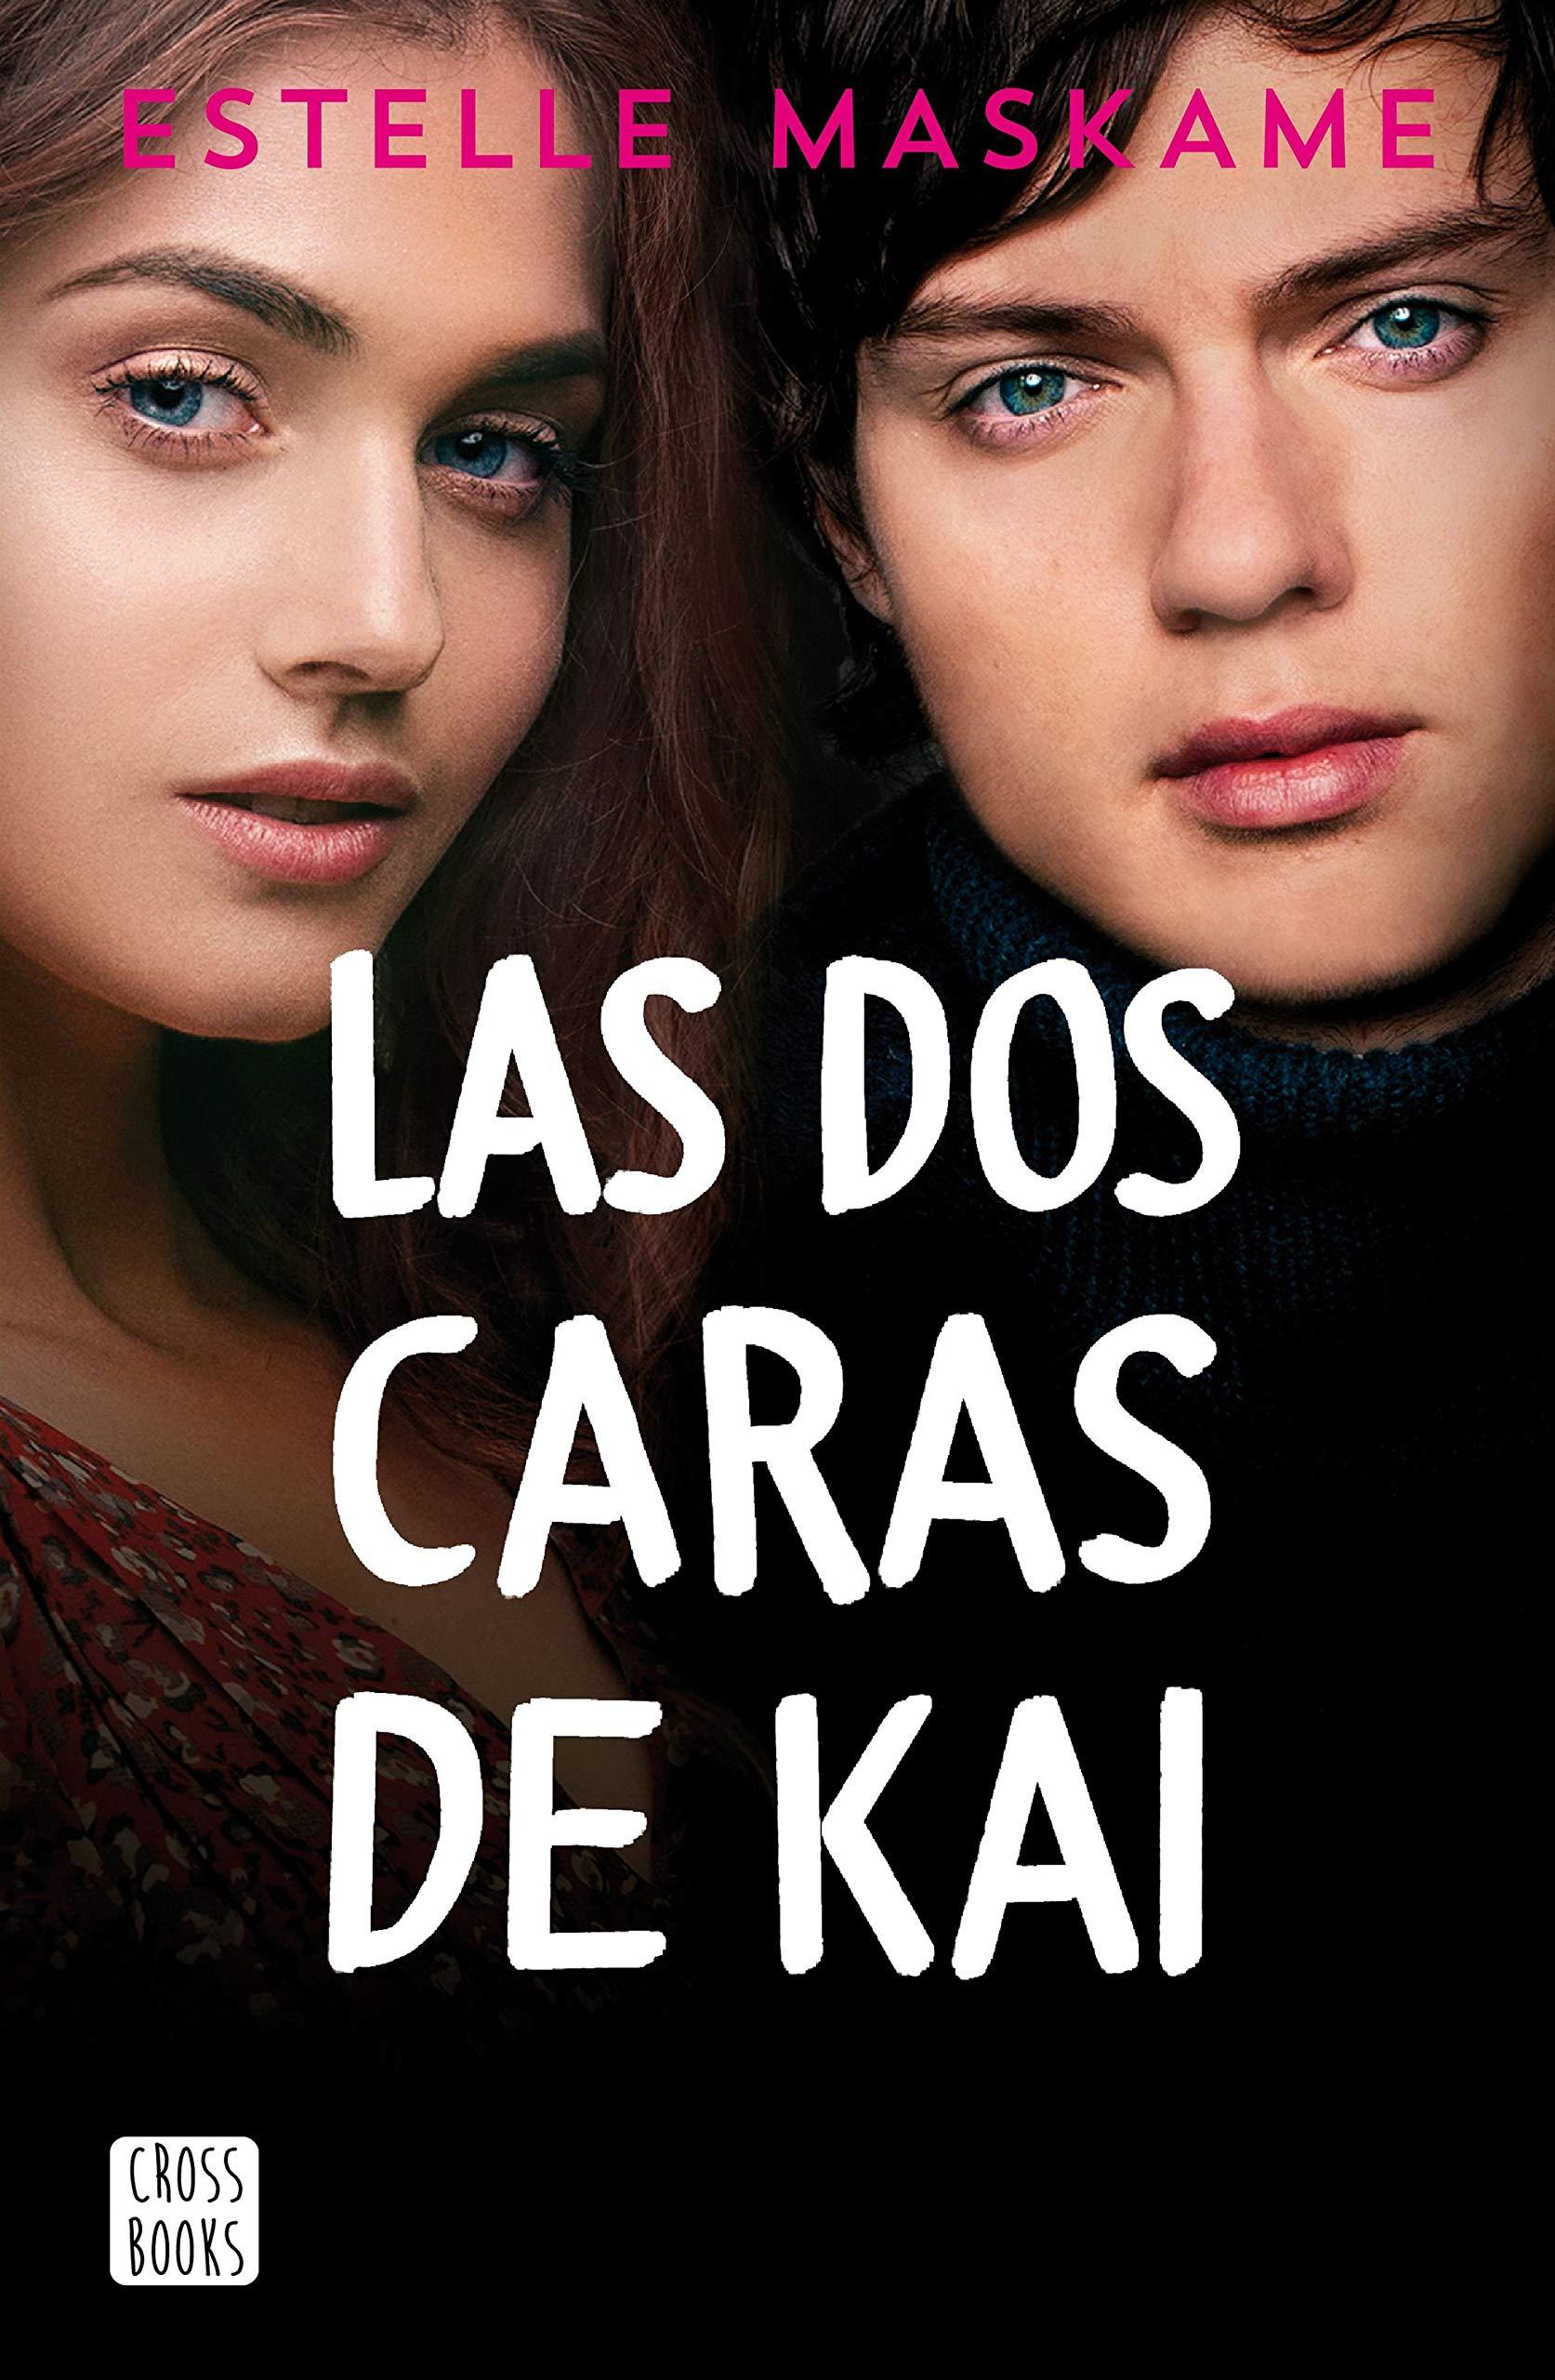 Las dos caras de Kai (Crossbooks): Amazon.es: Maskame ...